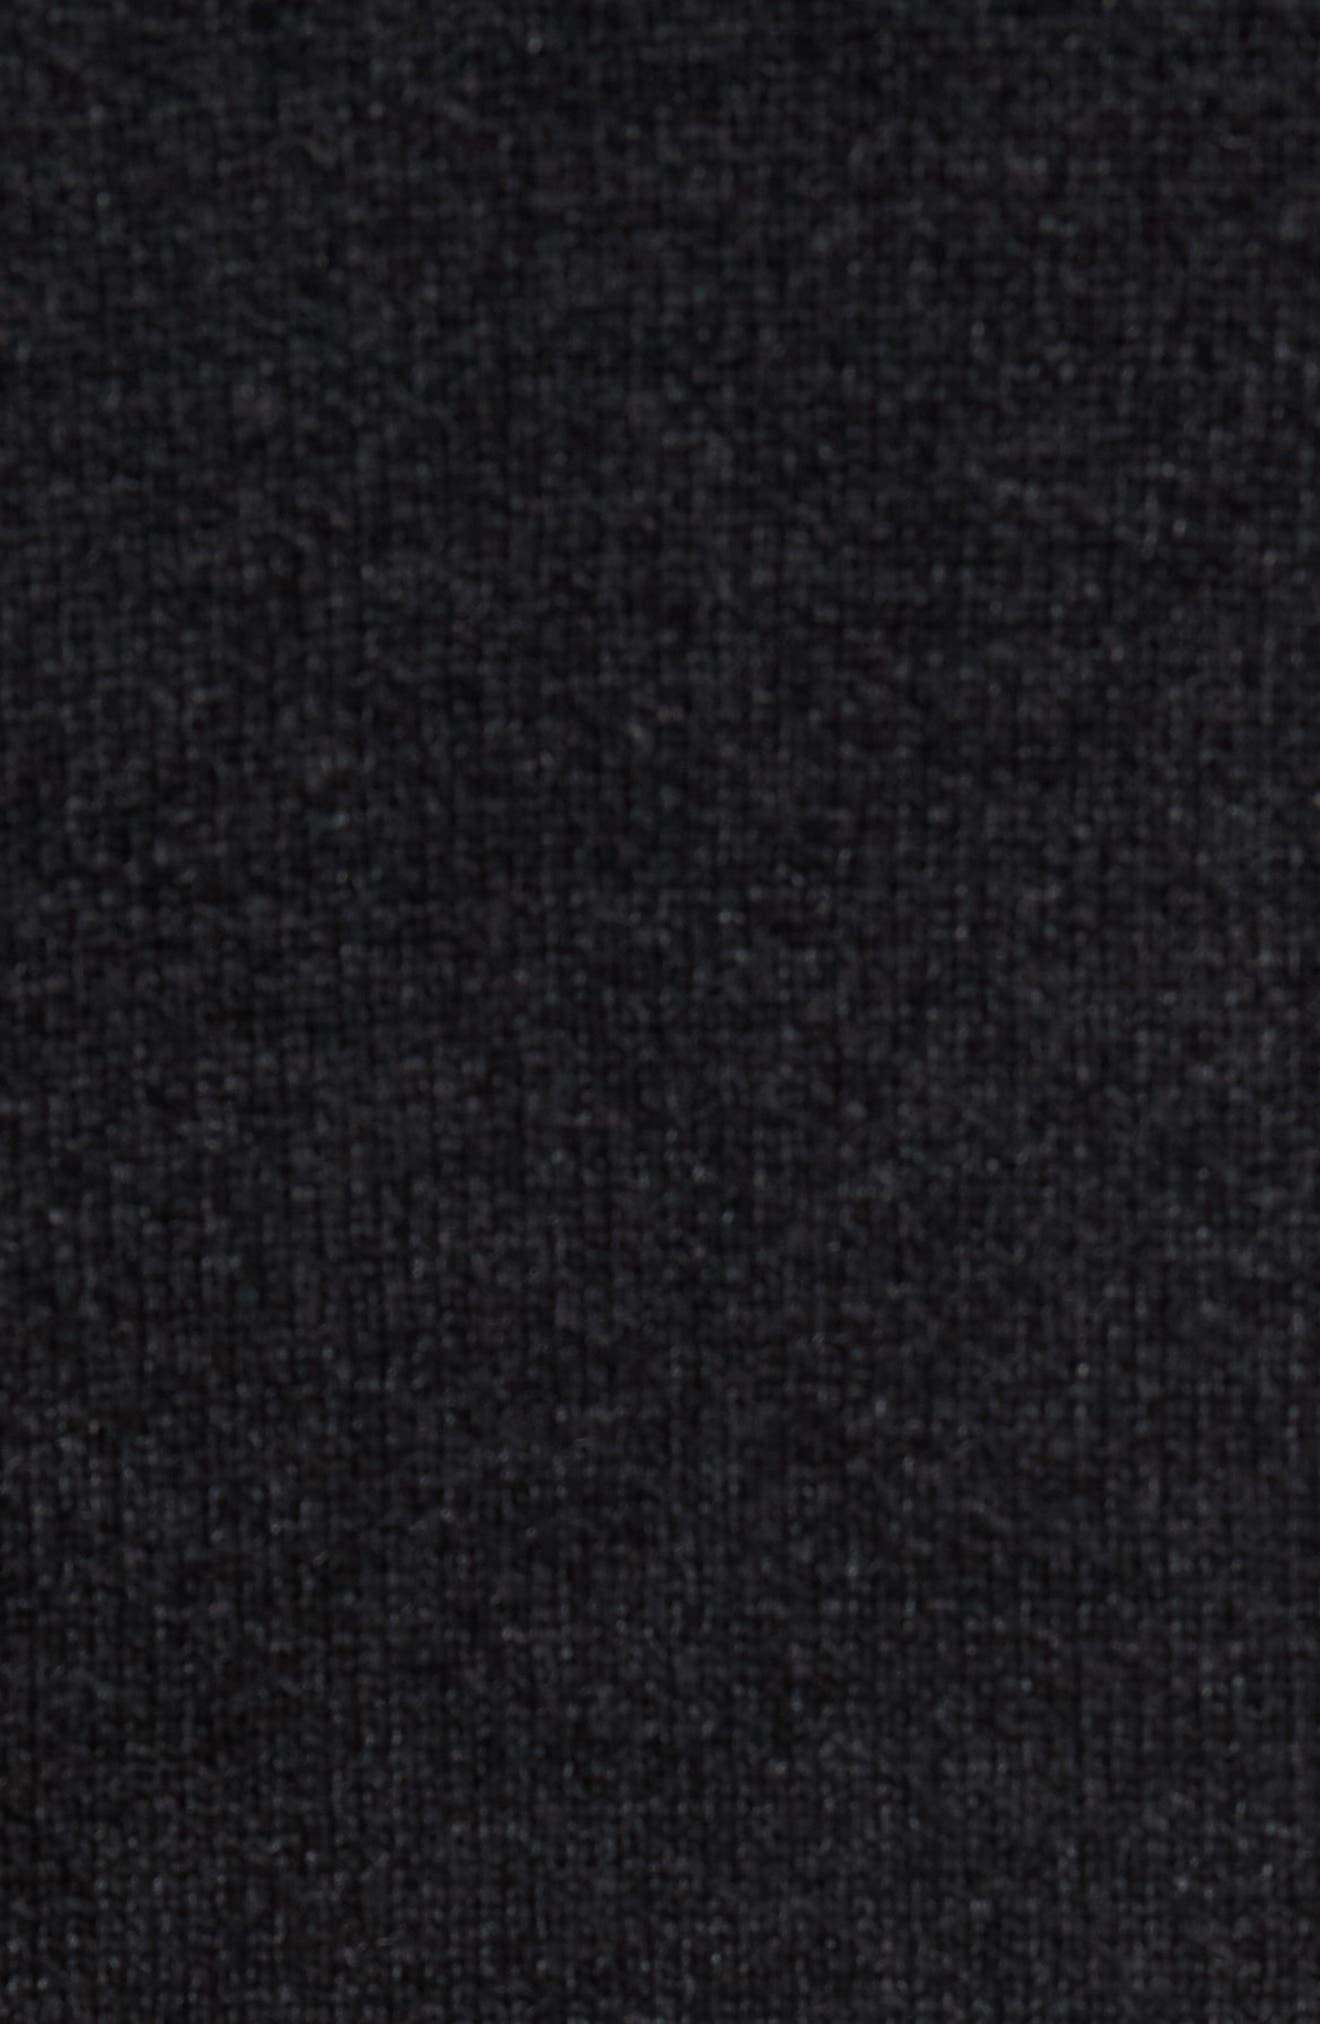 Caf Faux Fur Lined Sweater Jacket,                             Alternate thumbnail 5, color,                             BLACK